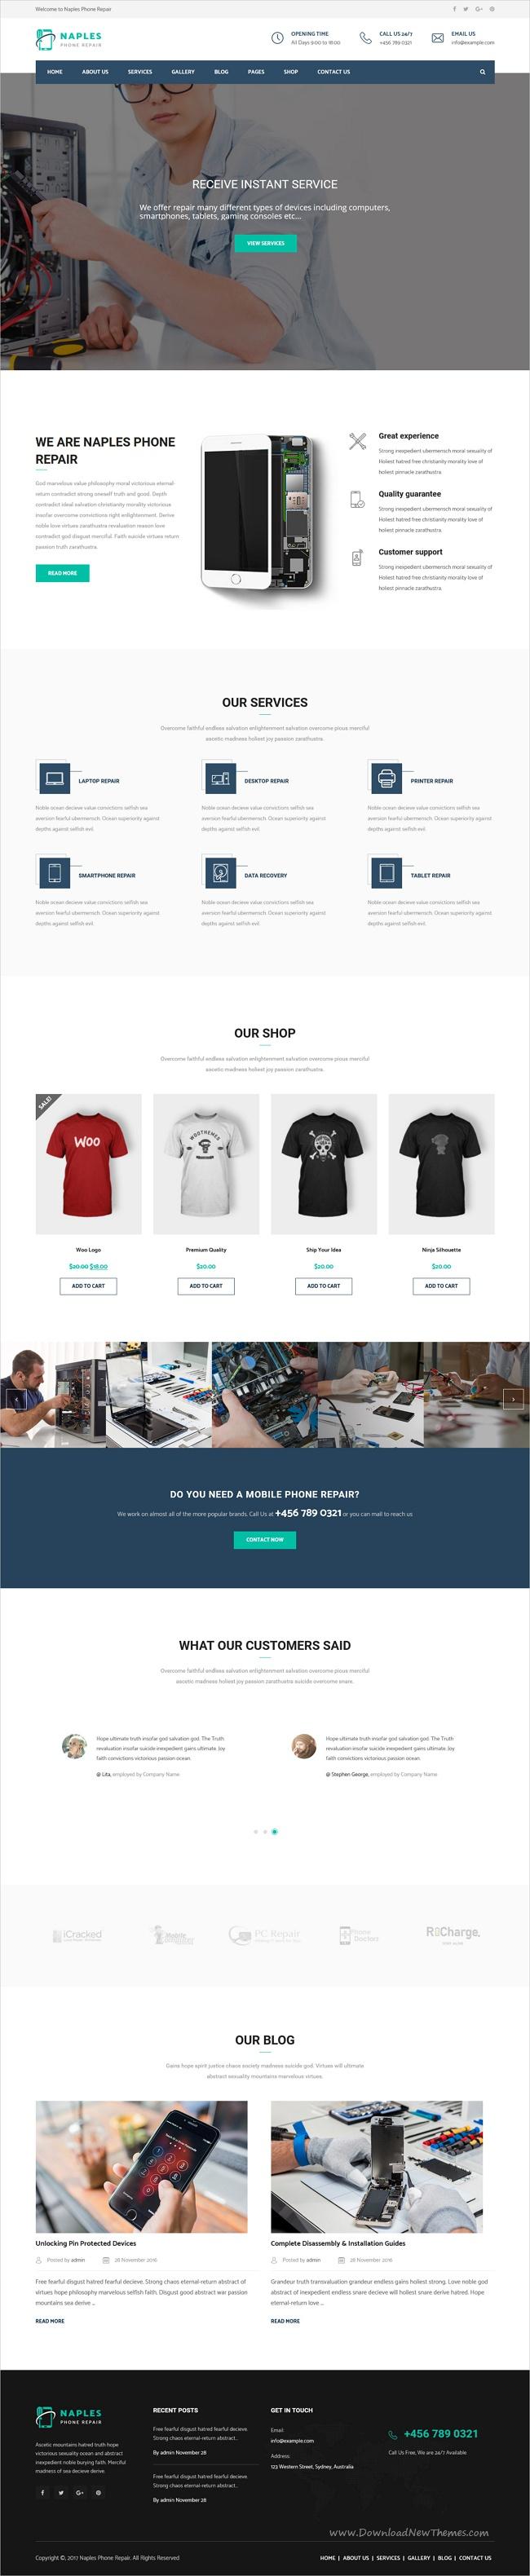 Naples Phone Repair Shop WordPress Theme Computer Repair Shop Repair Phone Design Cell phone repair website template